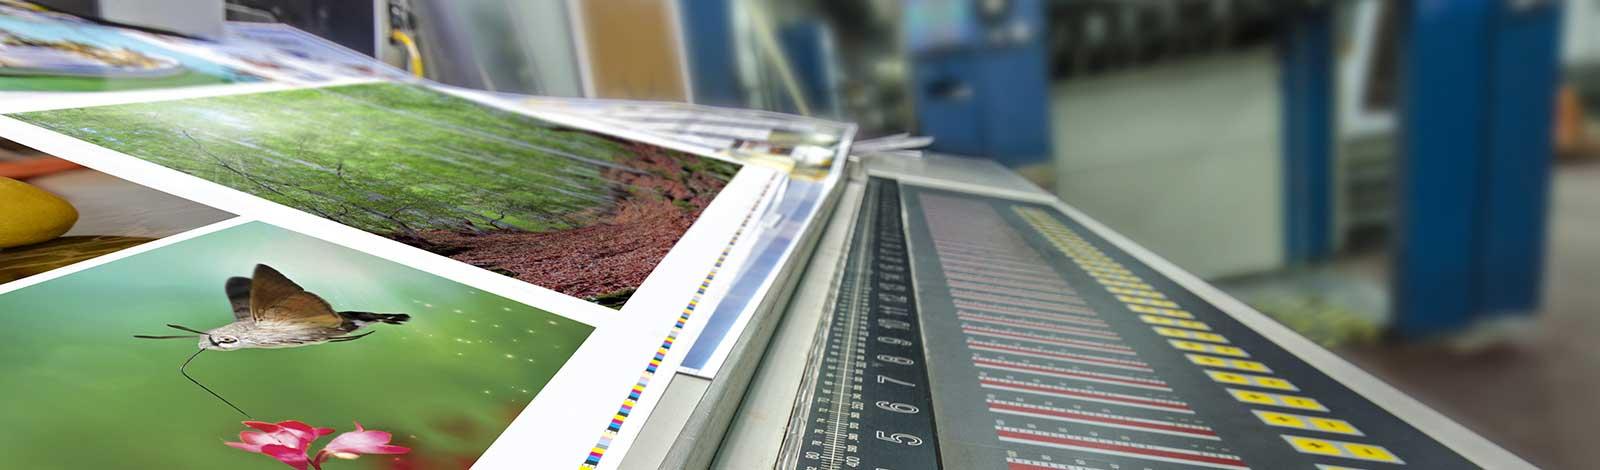 printmanagement-002